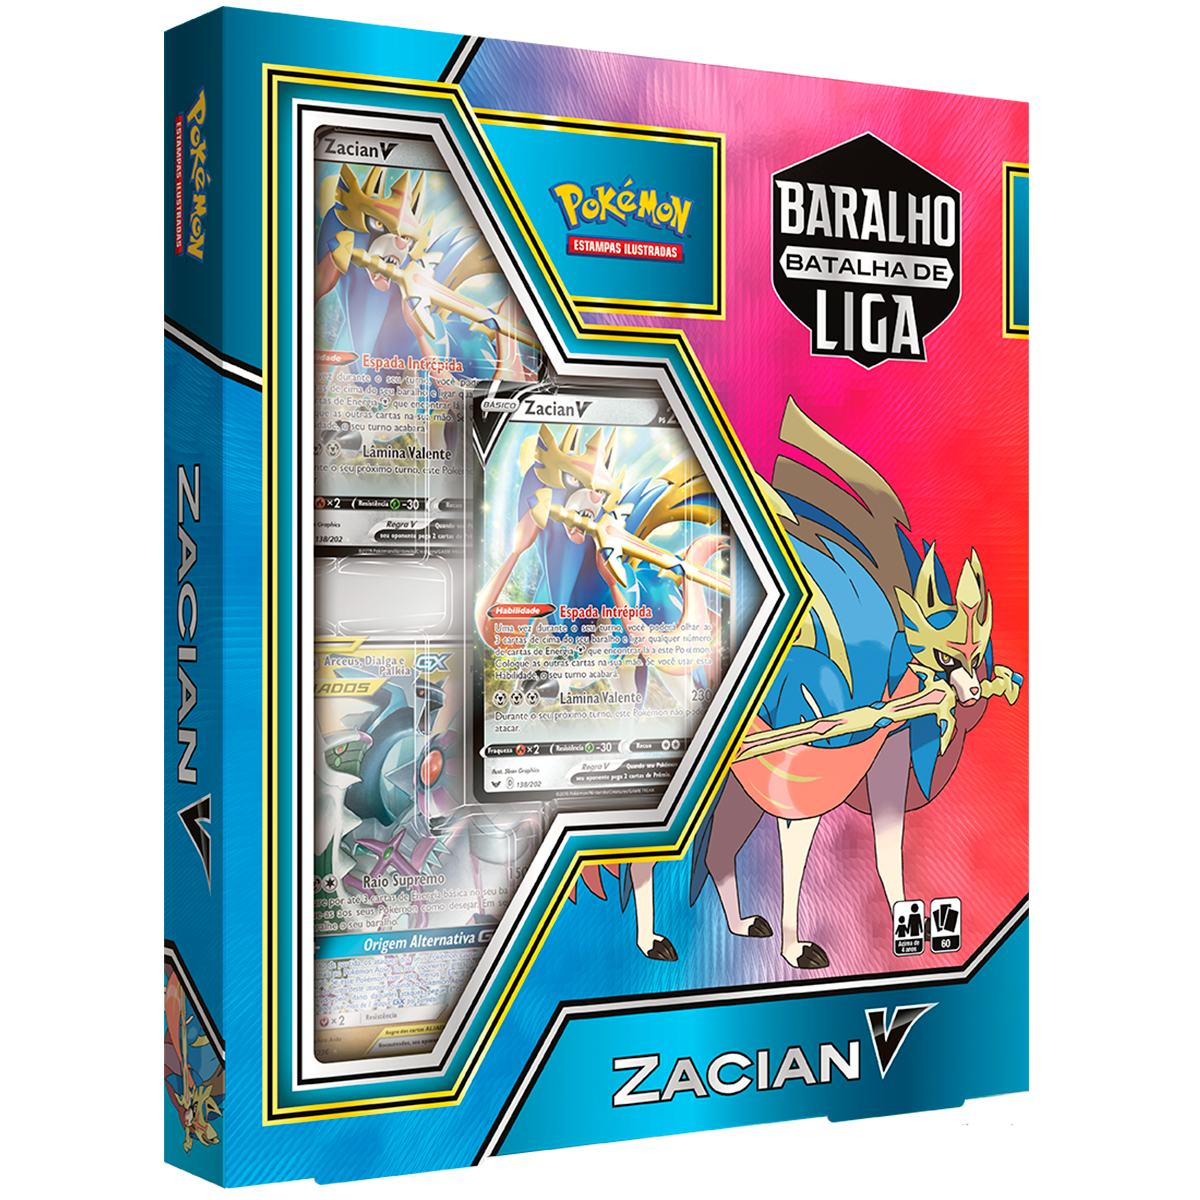 Pokemon Deck Baralha Batalha de Liga Zacian V